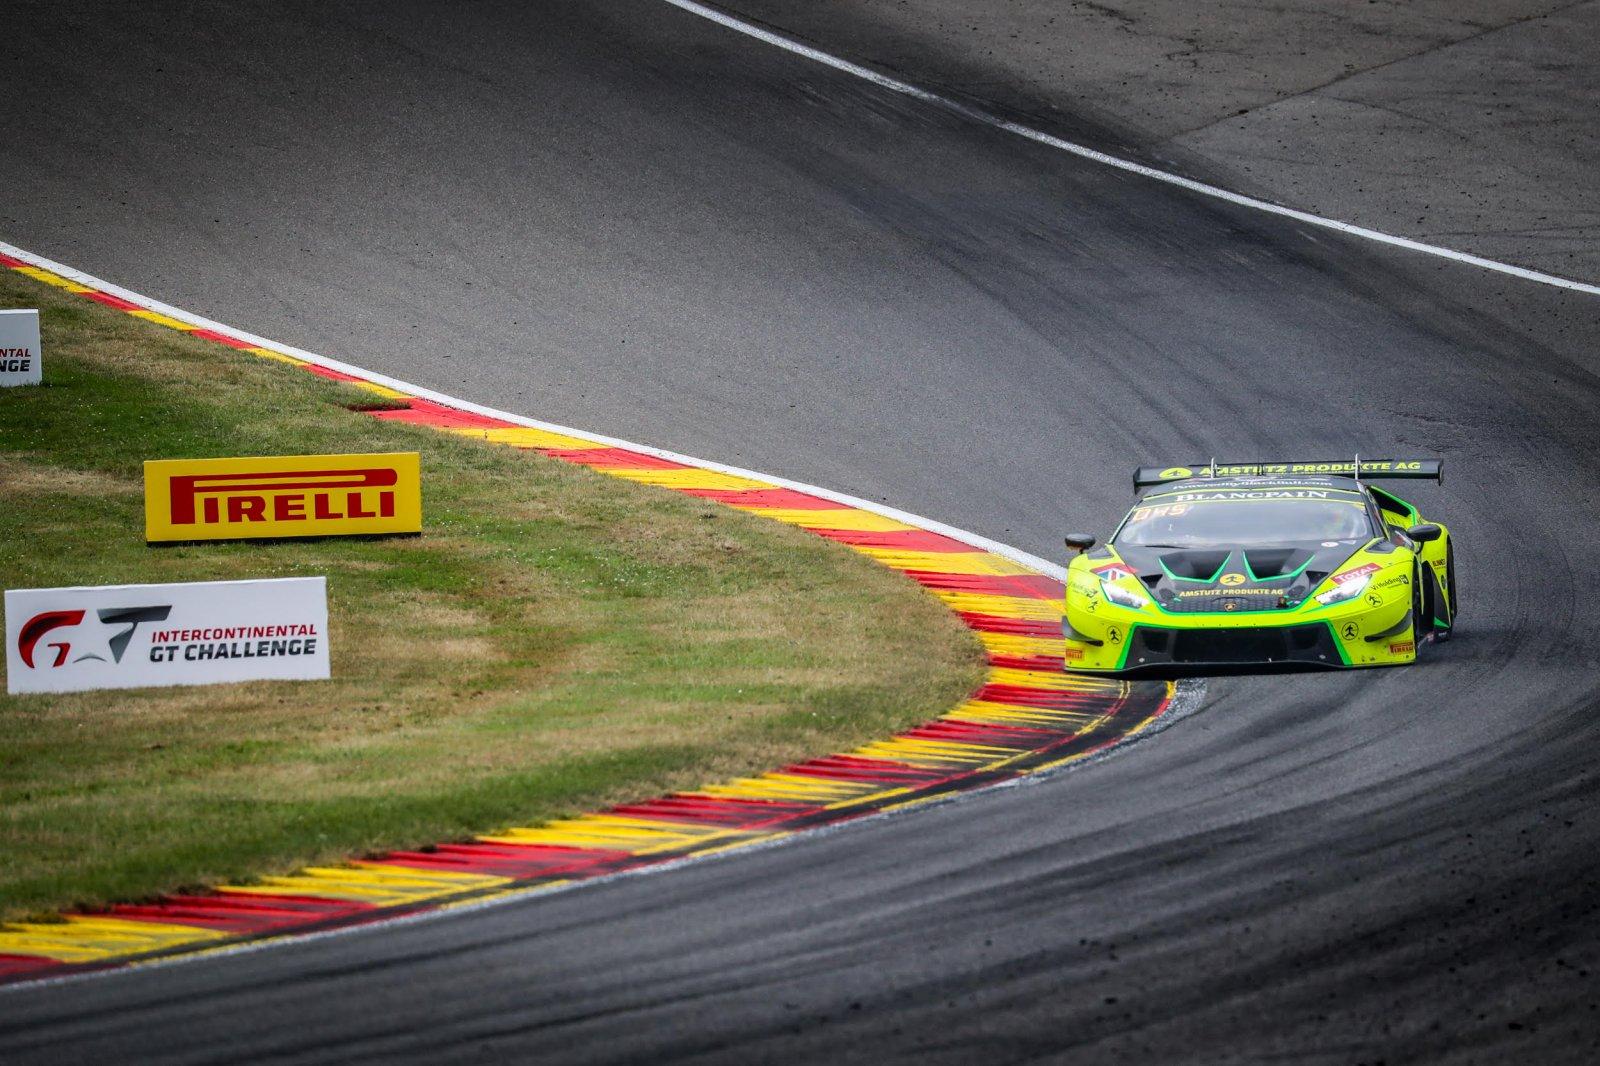 Kujala puts #77 Barwell Lamborghini on top in pre-qualifying